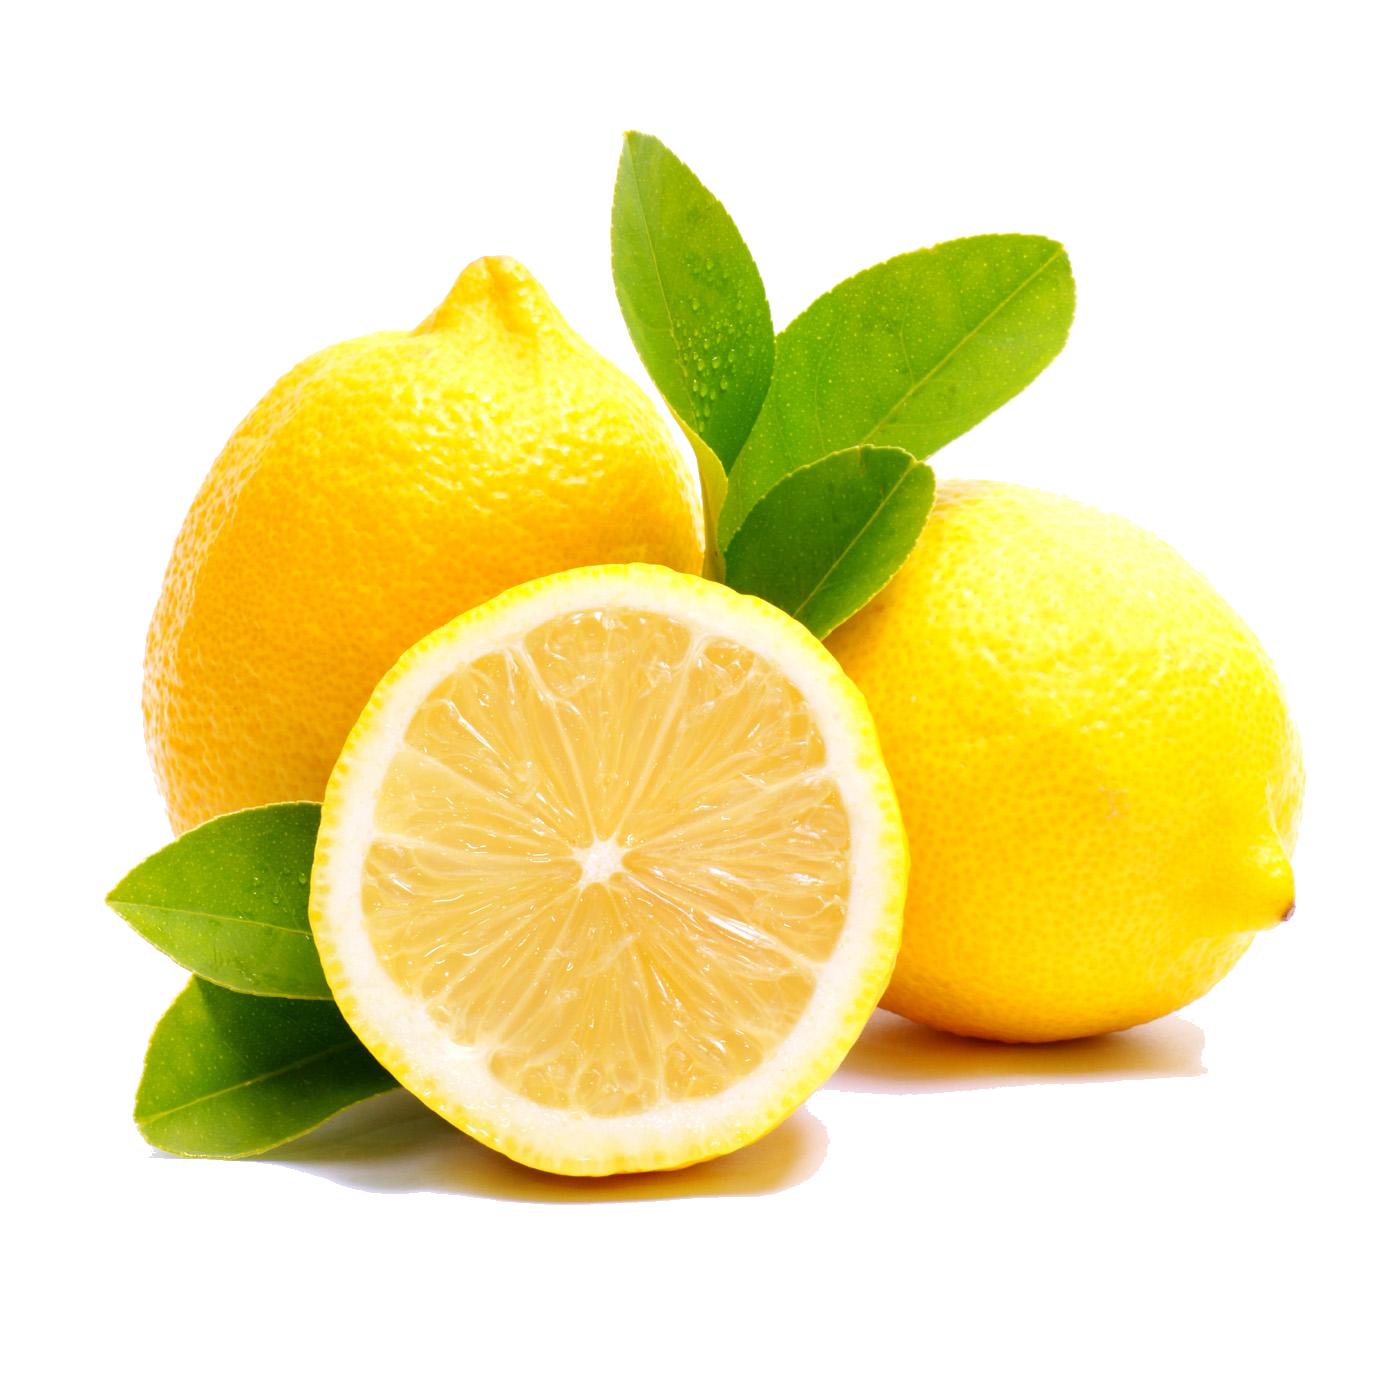 banner free download Lemon PNG Image